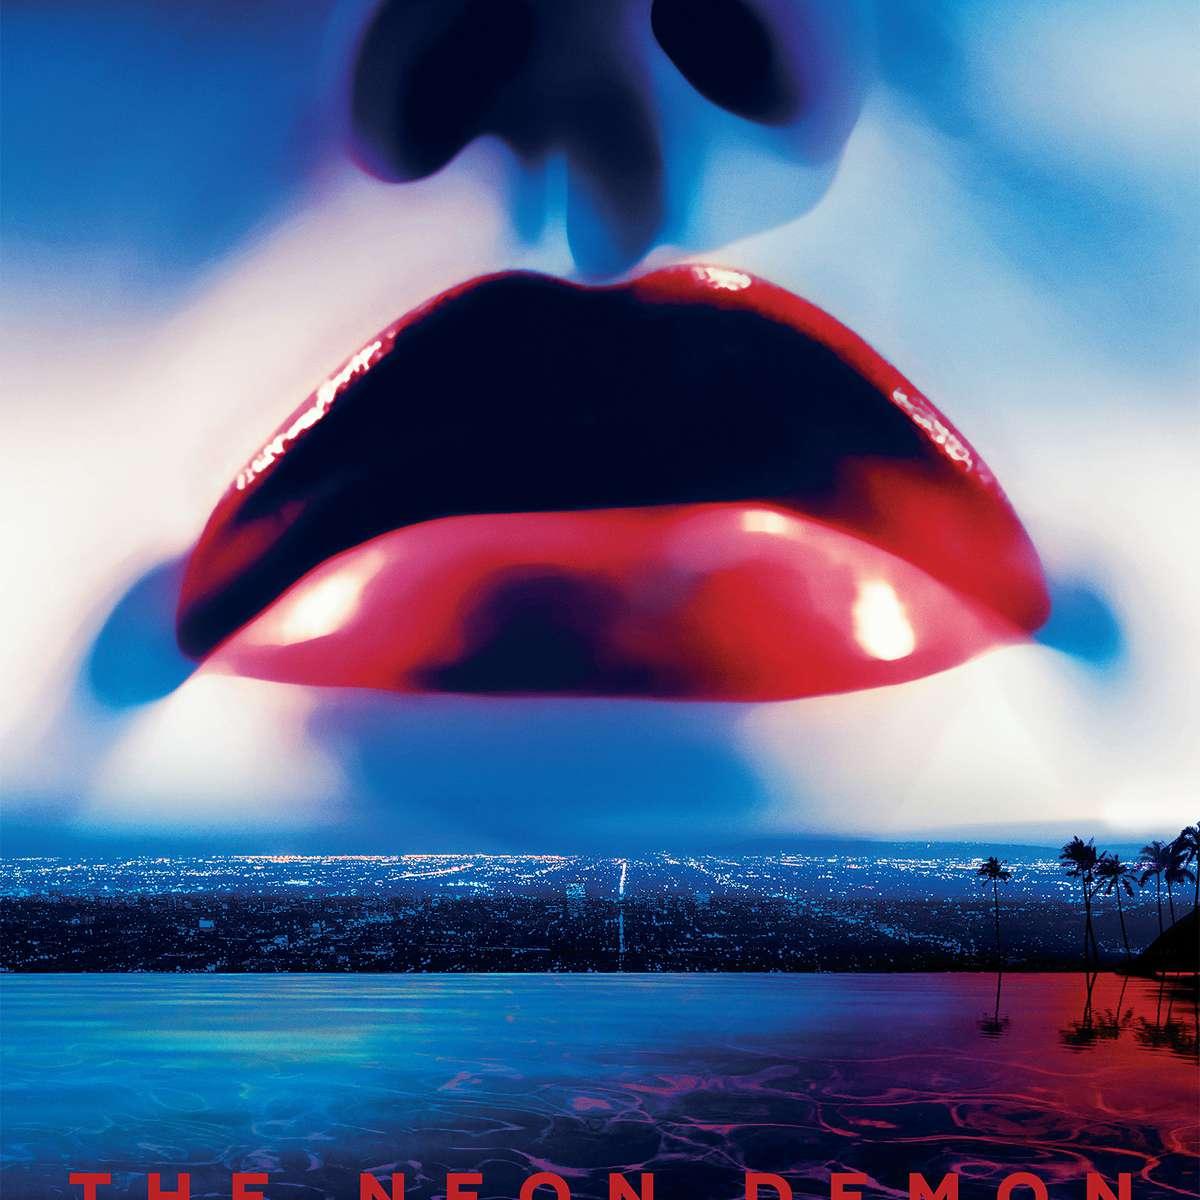 The Neon Demon (2016) movie poster.